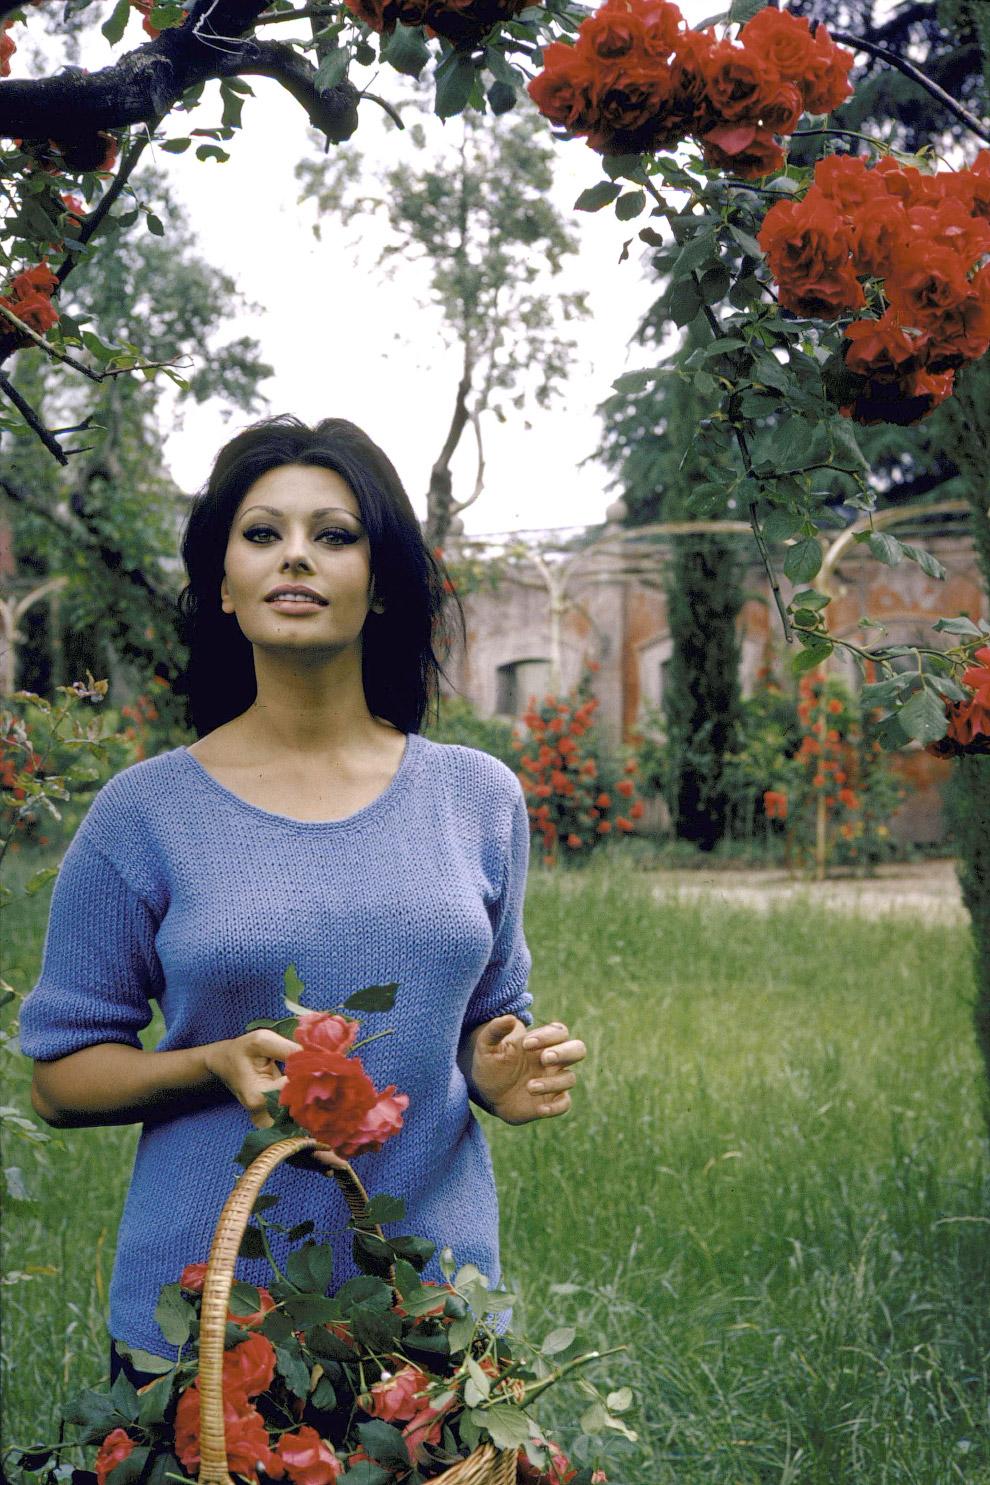 Софи лорен цветы фото